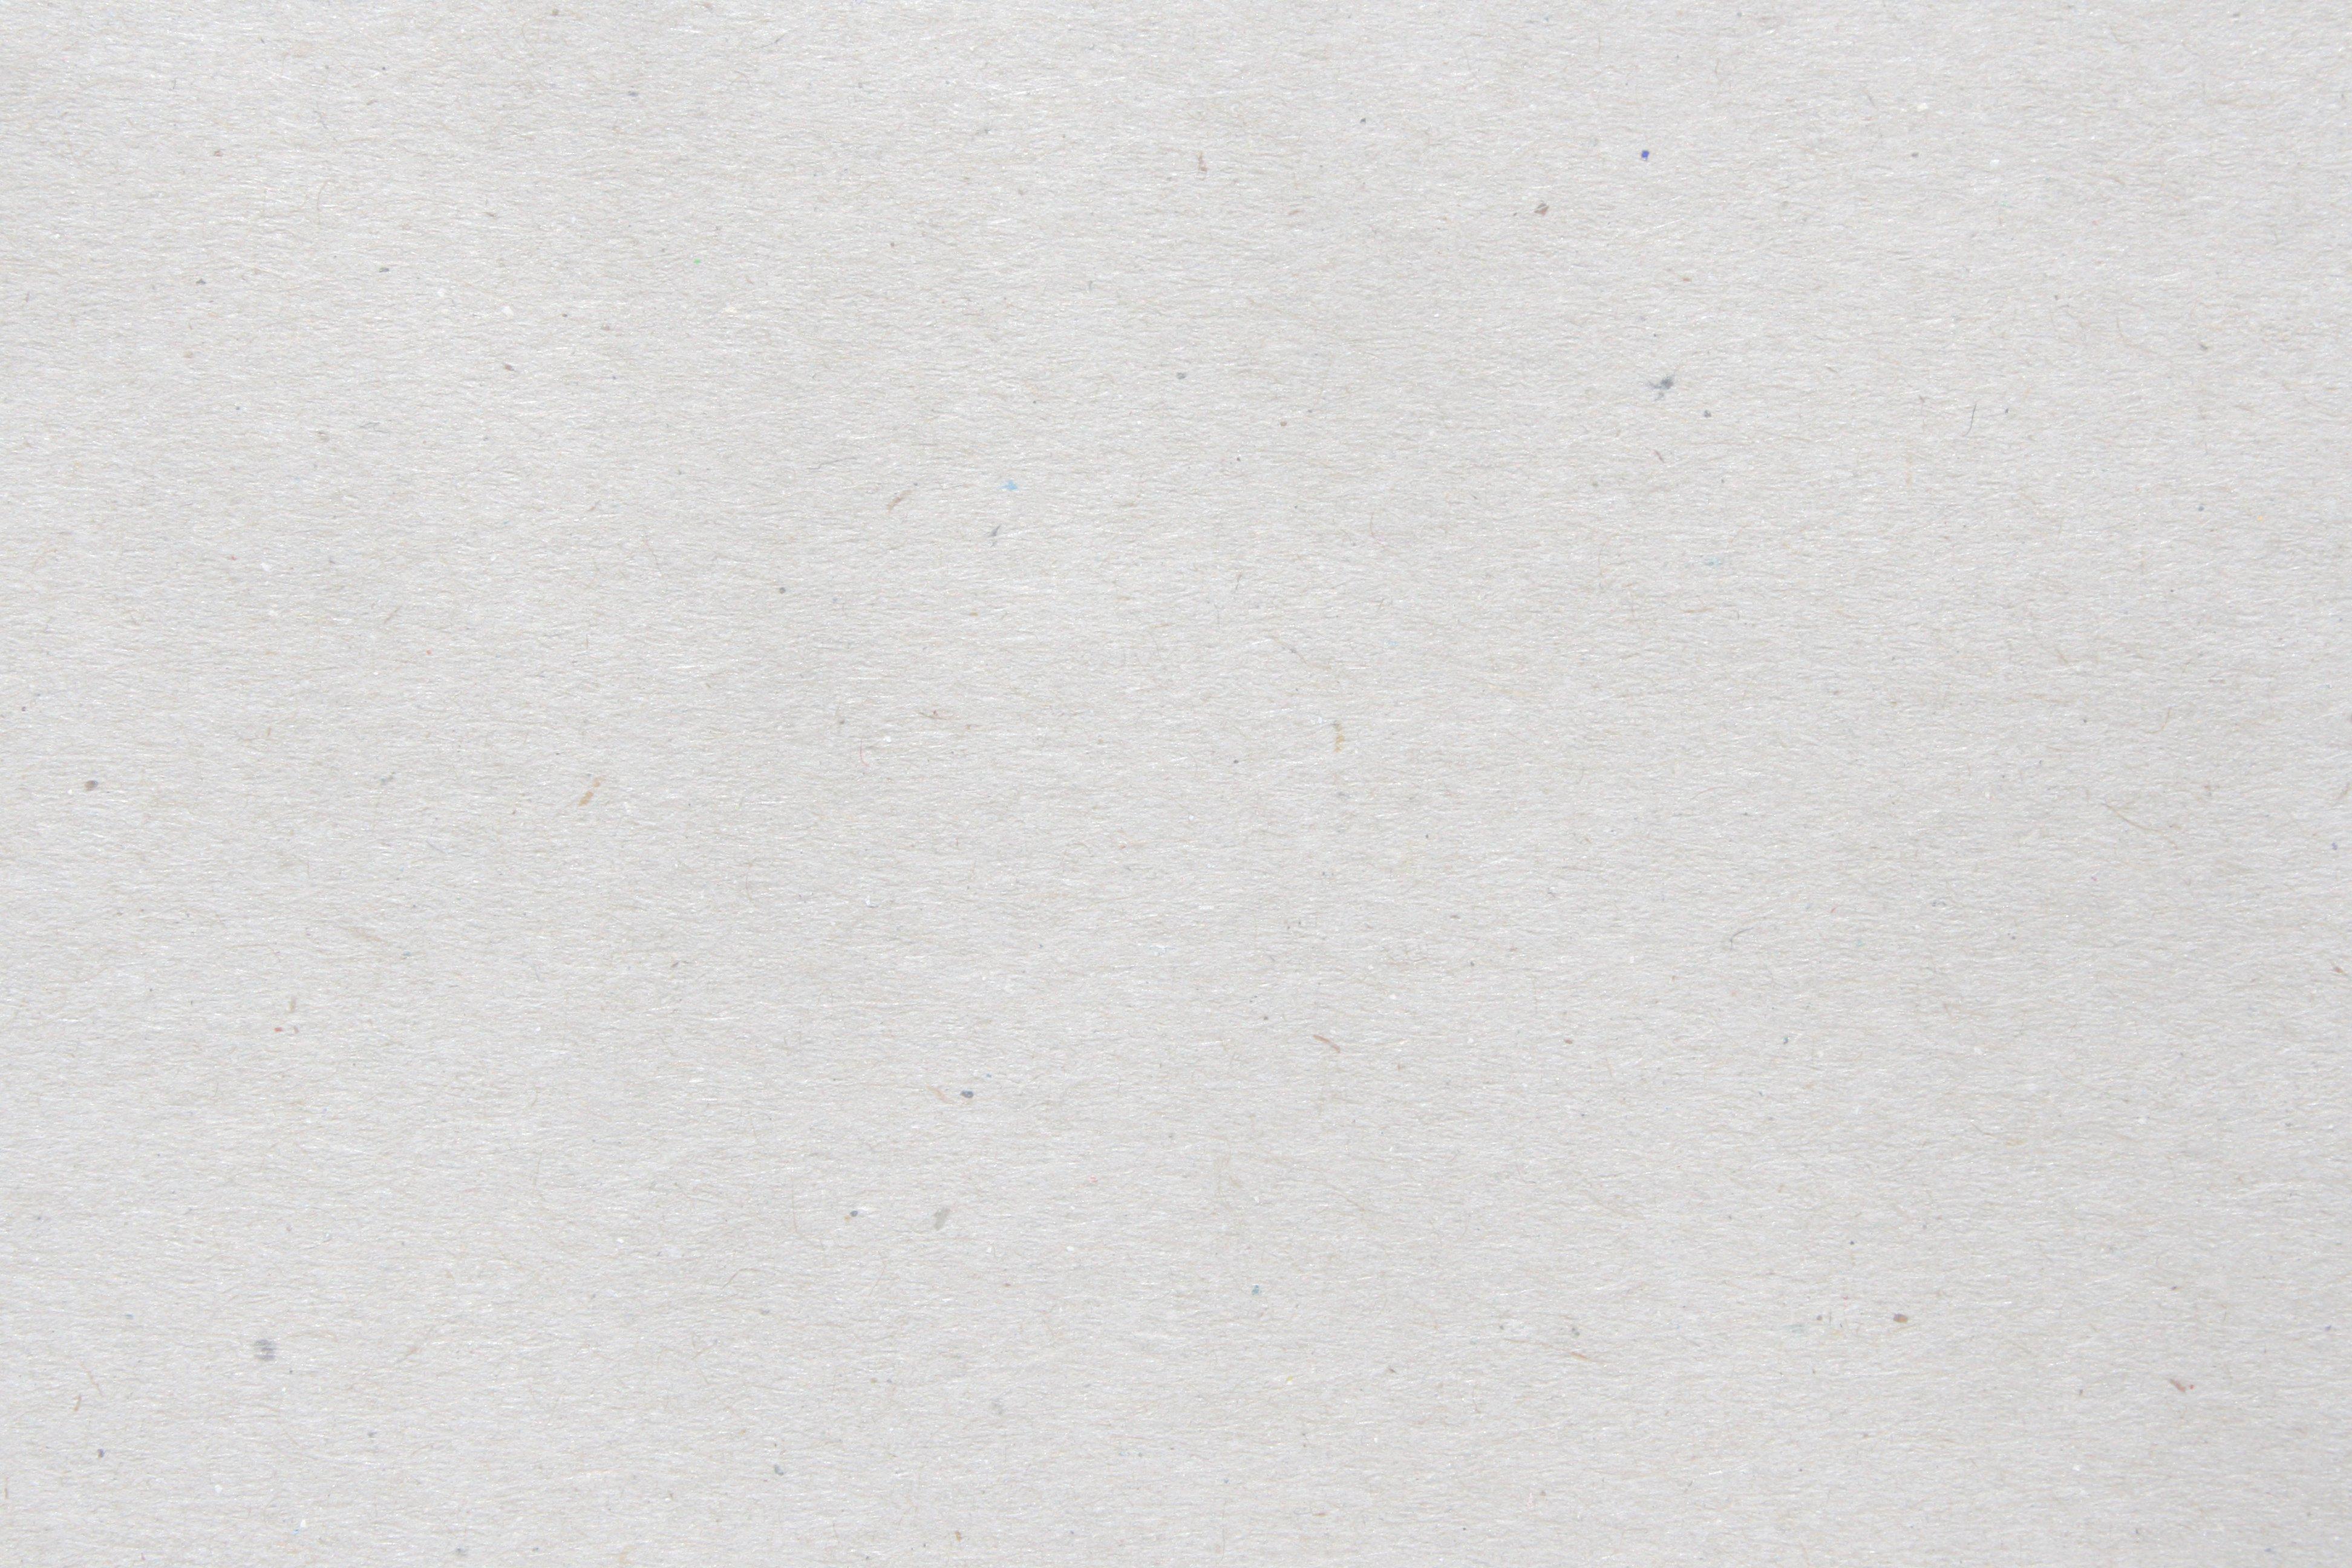 White Paper Texture With Flecks